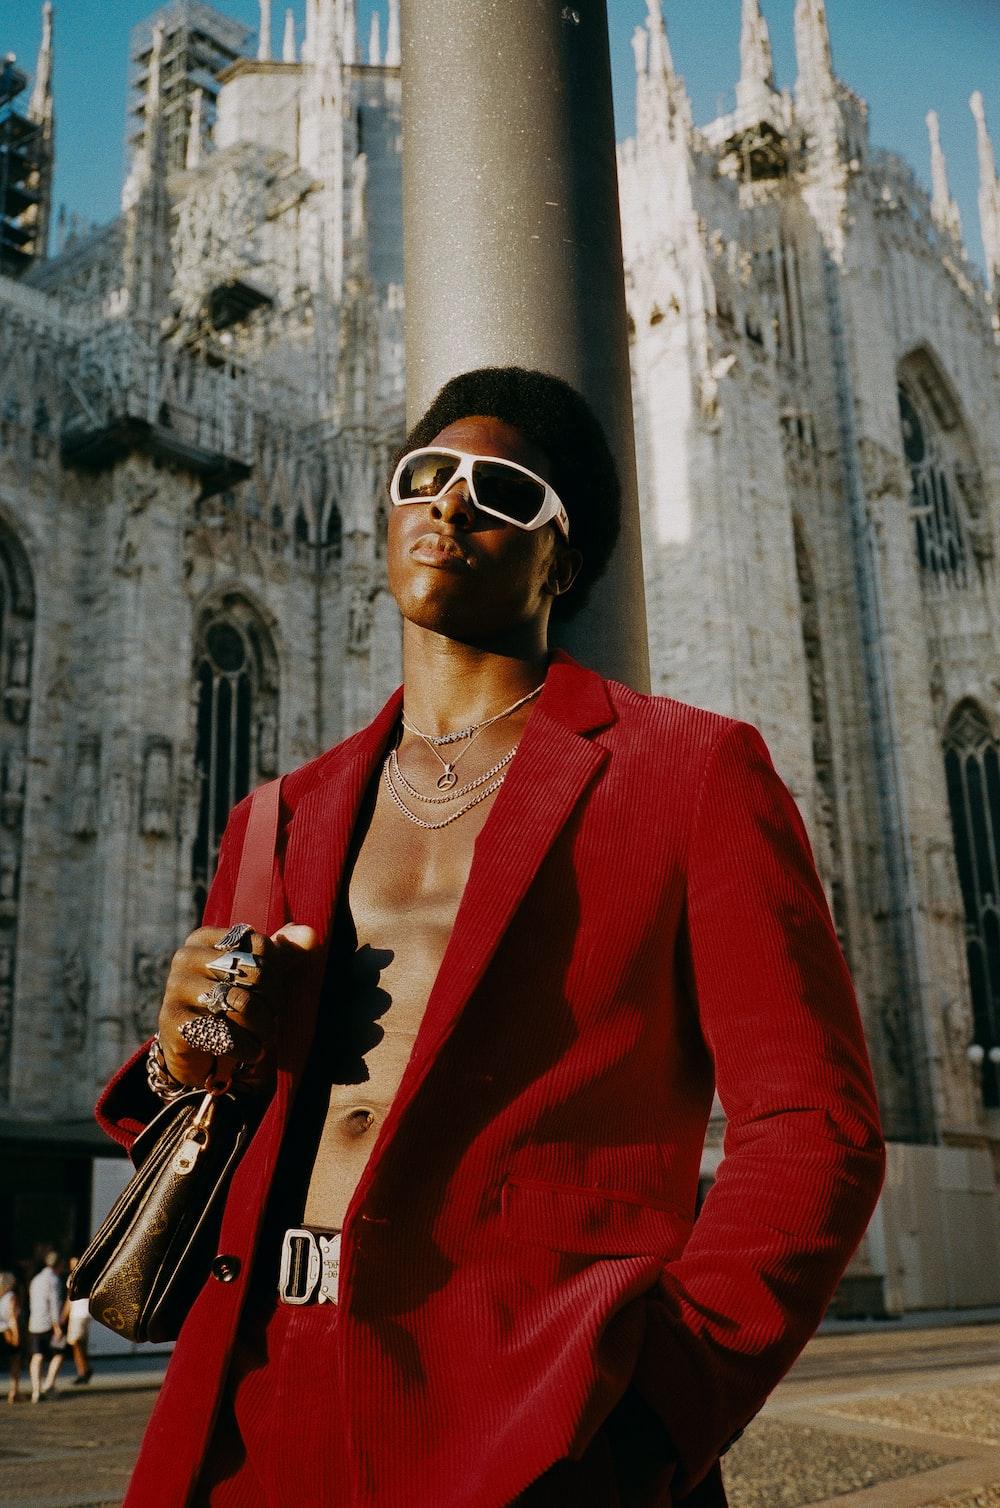 man in red suit jacket wearing black sunglasses